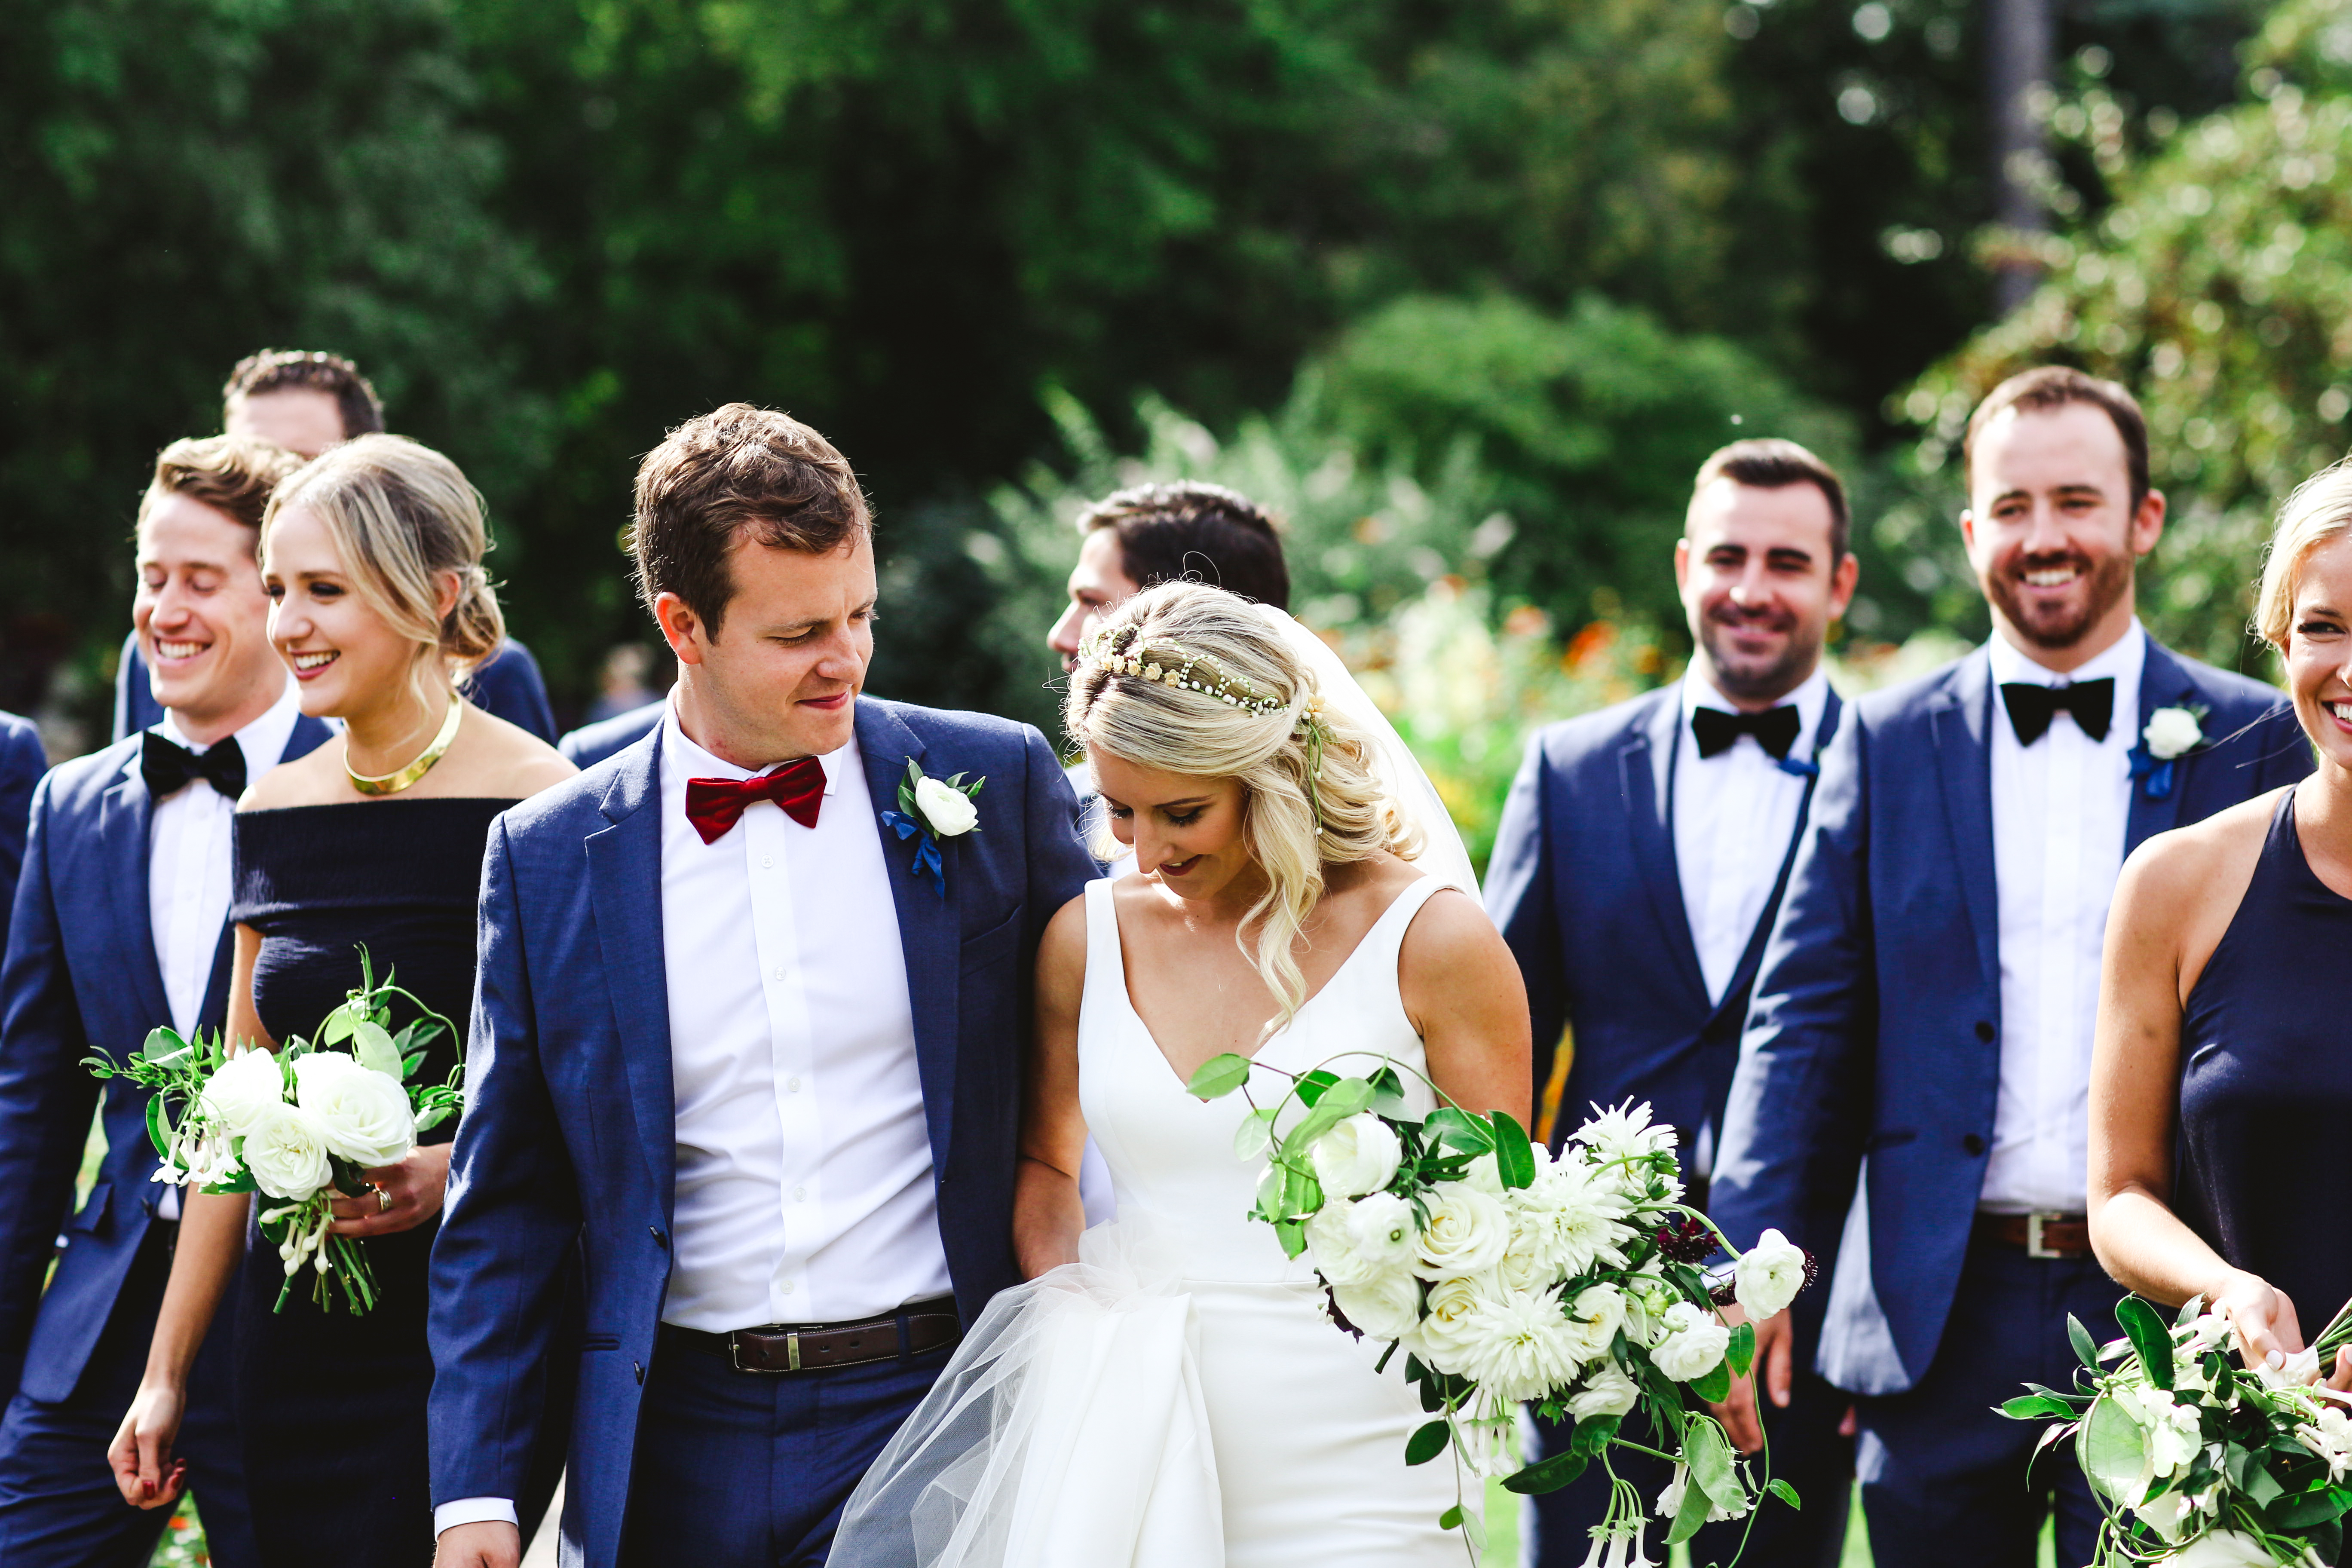 Wedding party walking - Mansion Wedding - Amanda Douglas Events